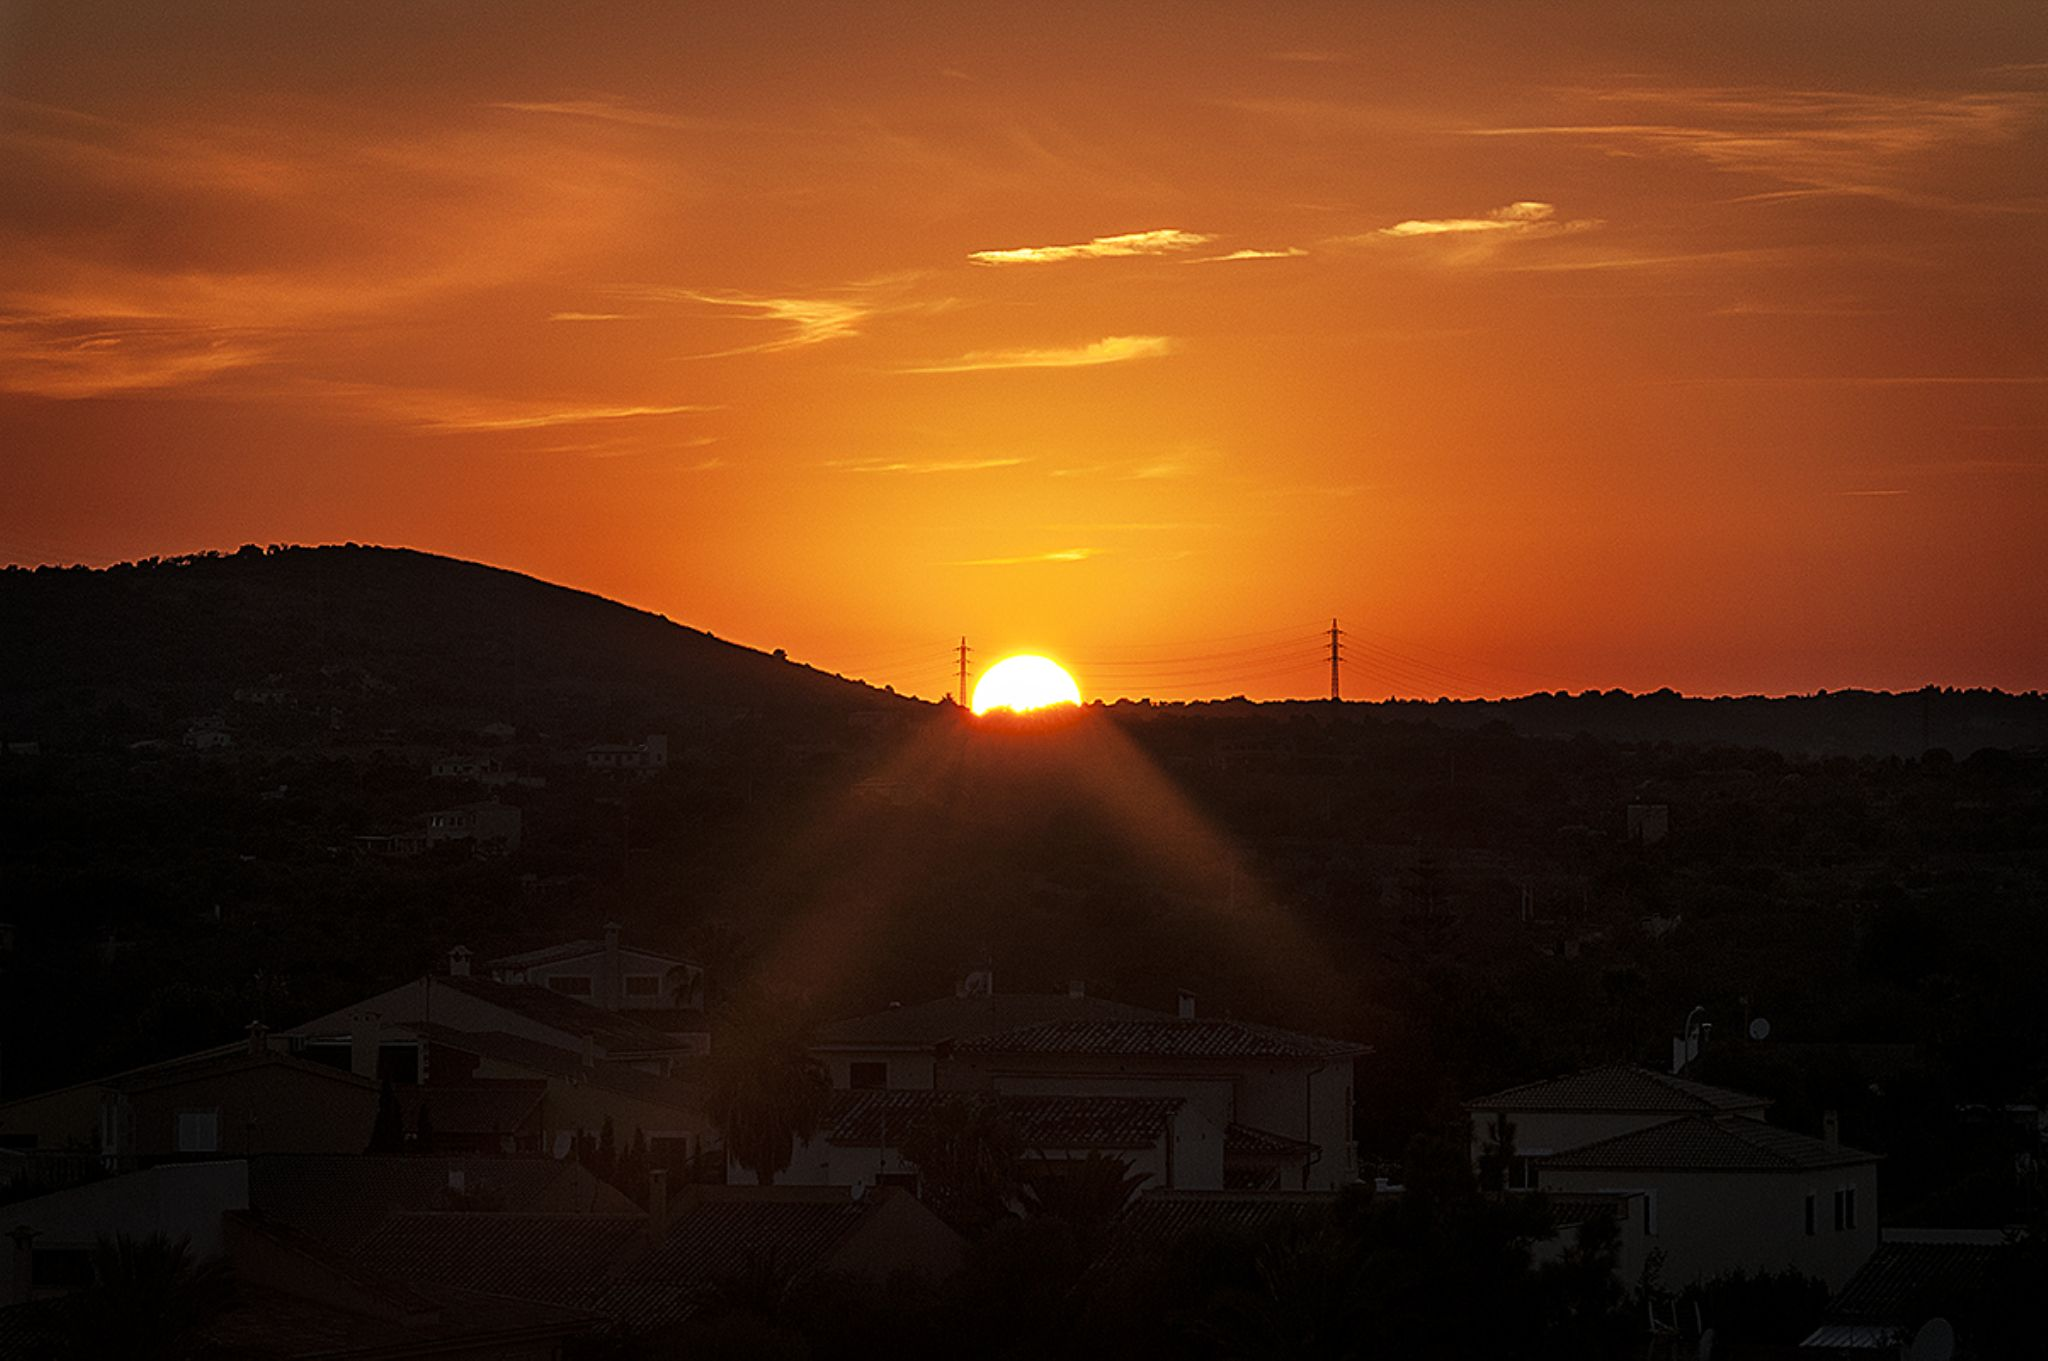 Sunset by stephanie_degen_photography